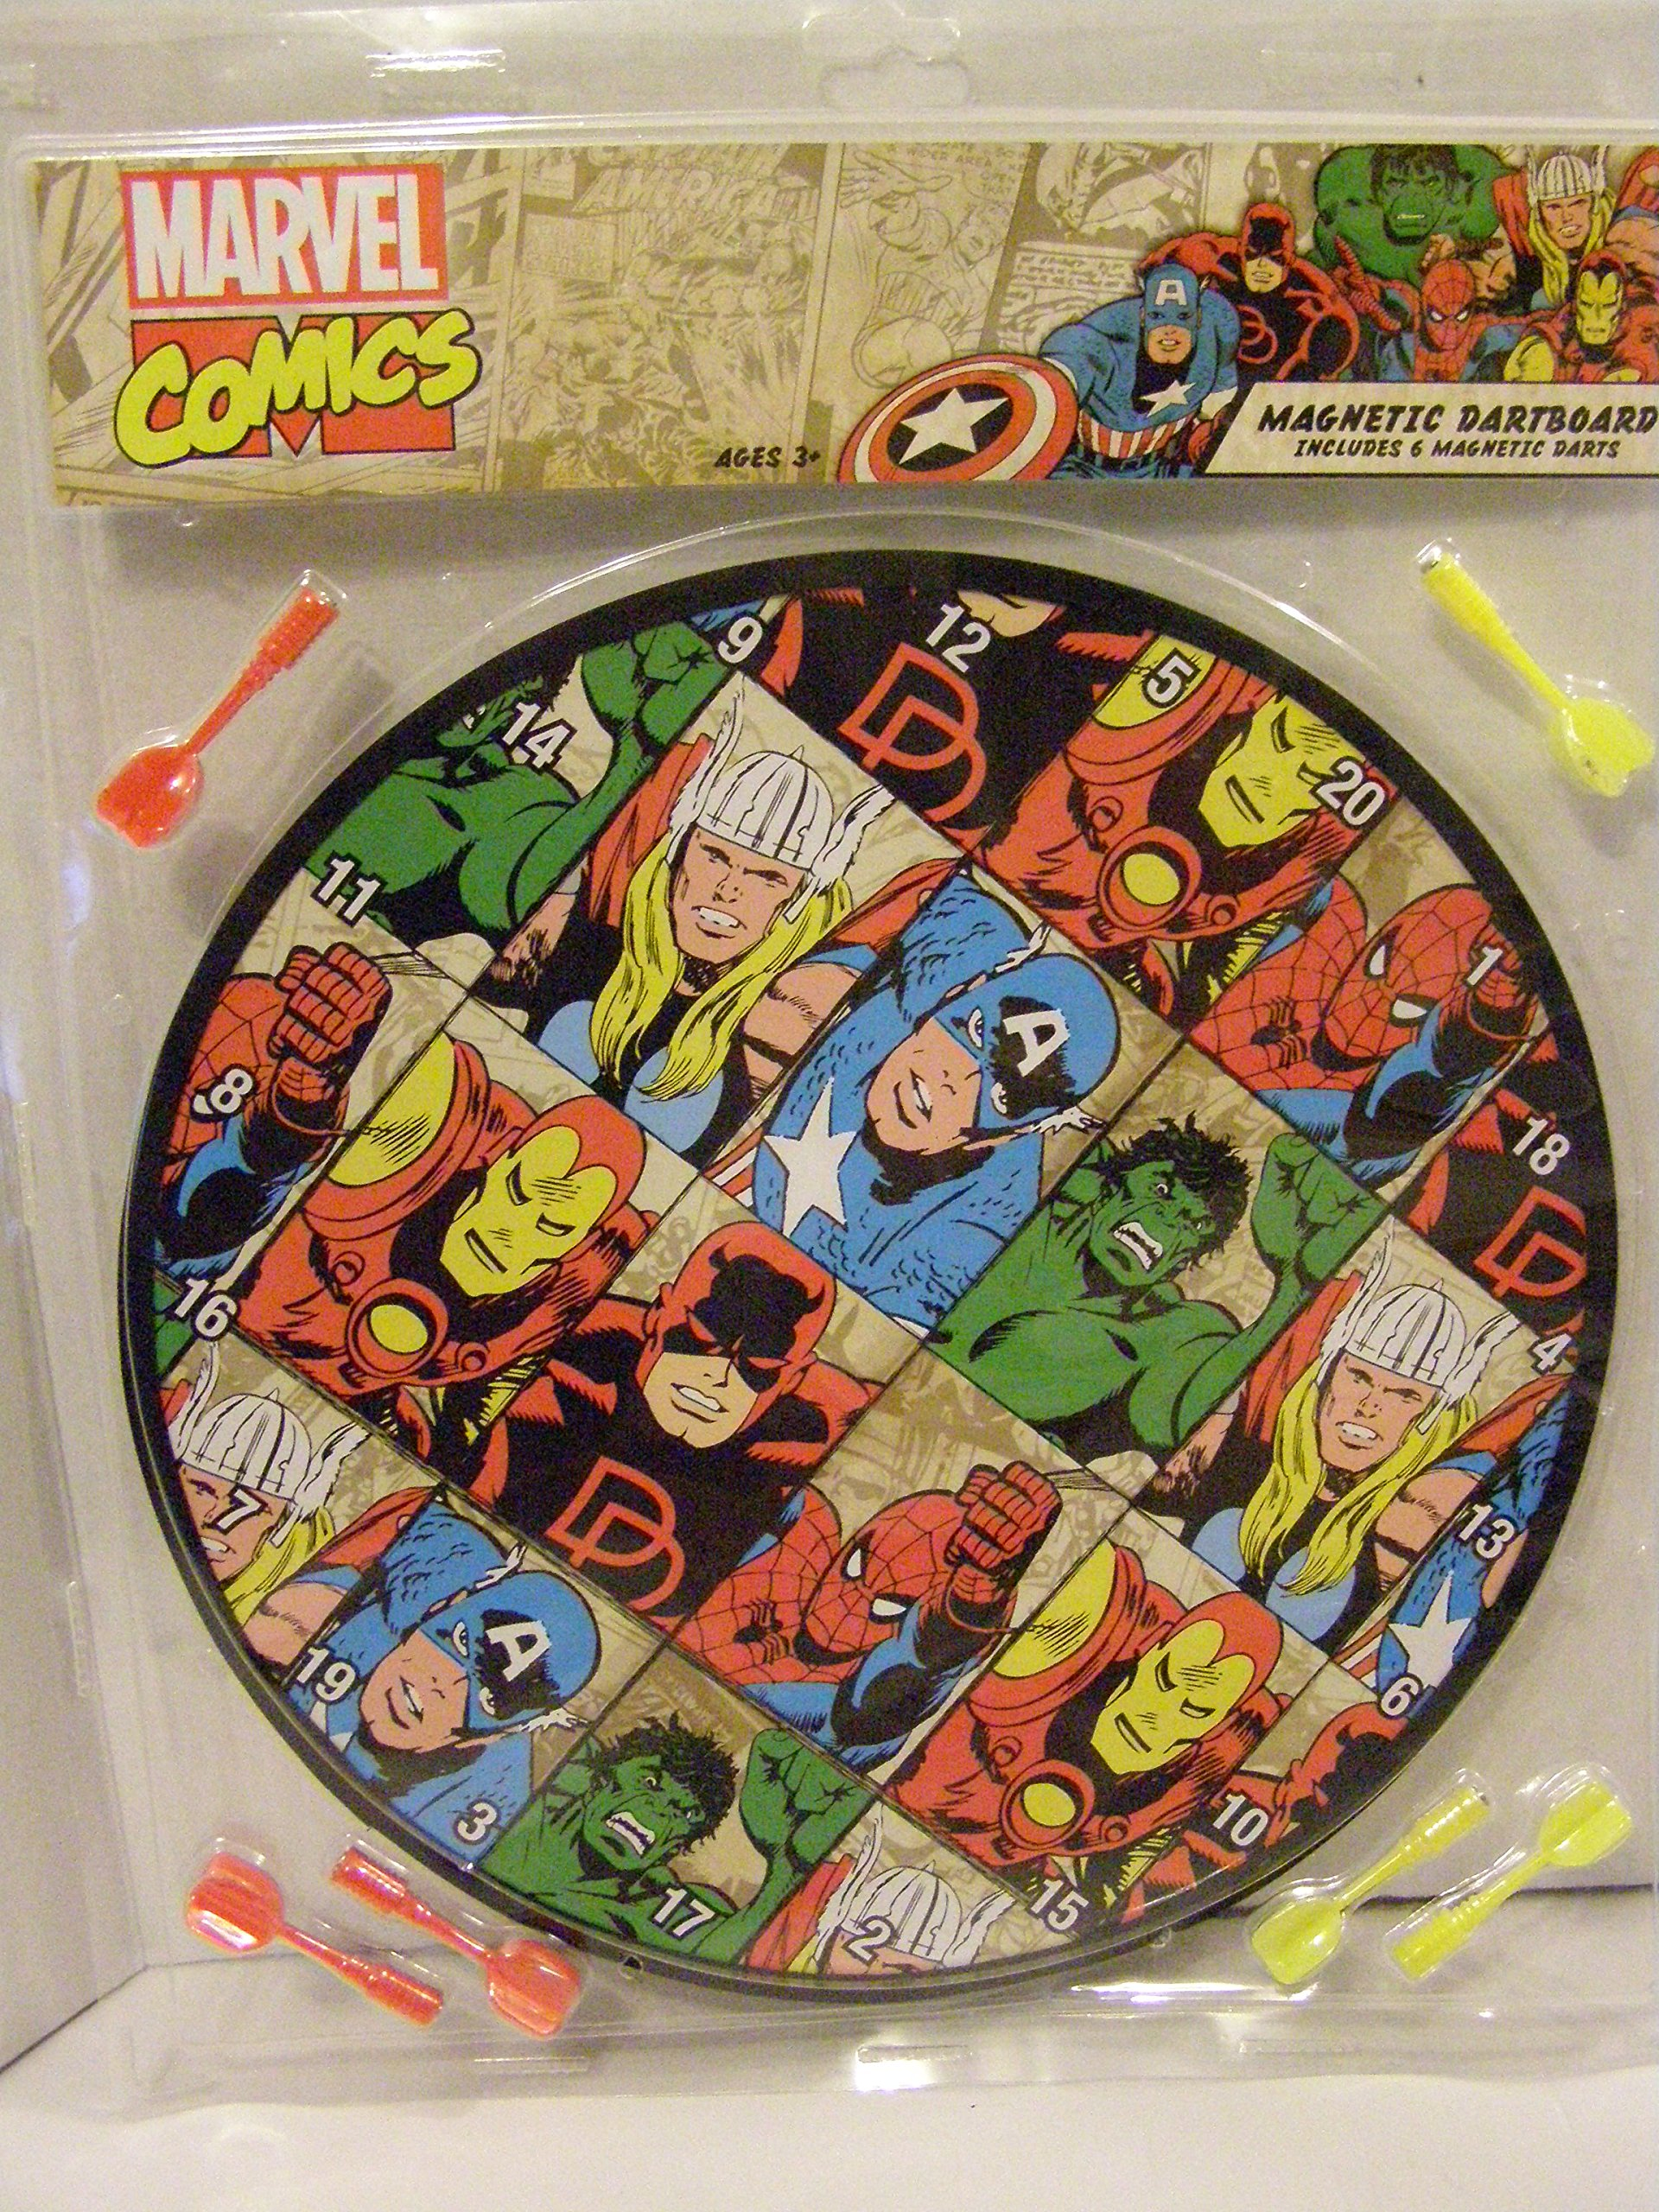 MARVEL COMIC SUPERHEROES REVERSIBLE MAGNETIC DARTBOARD